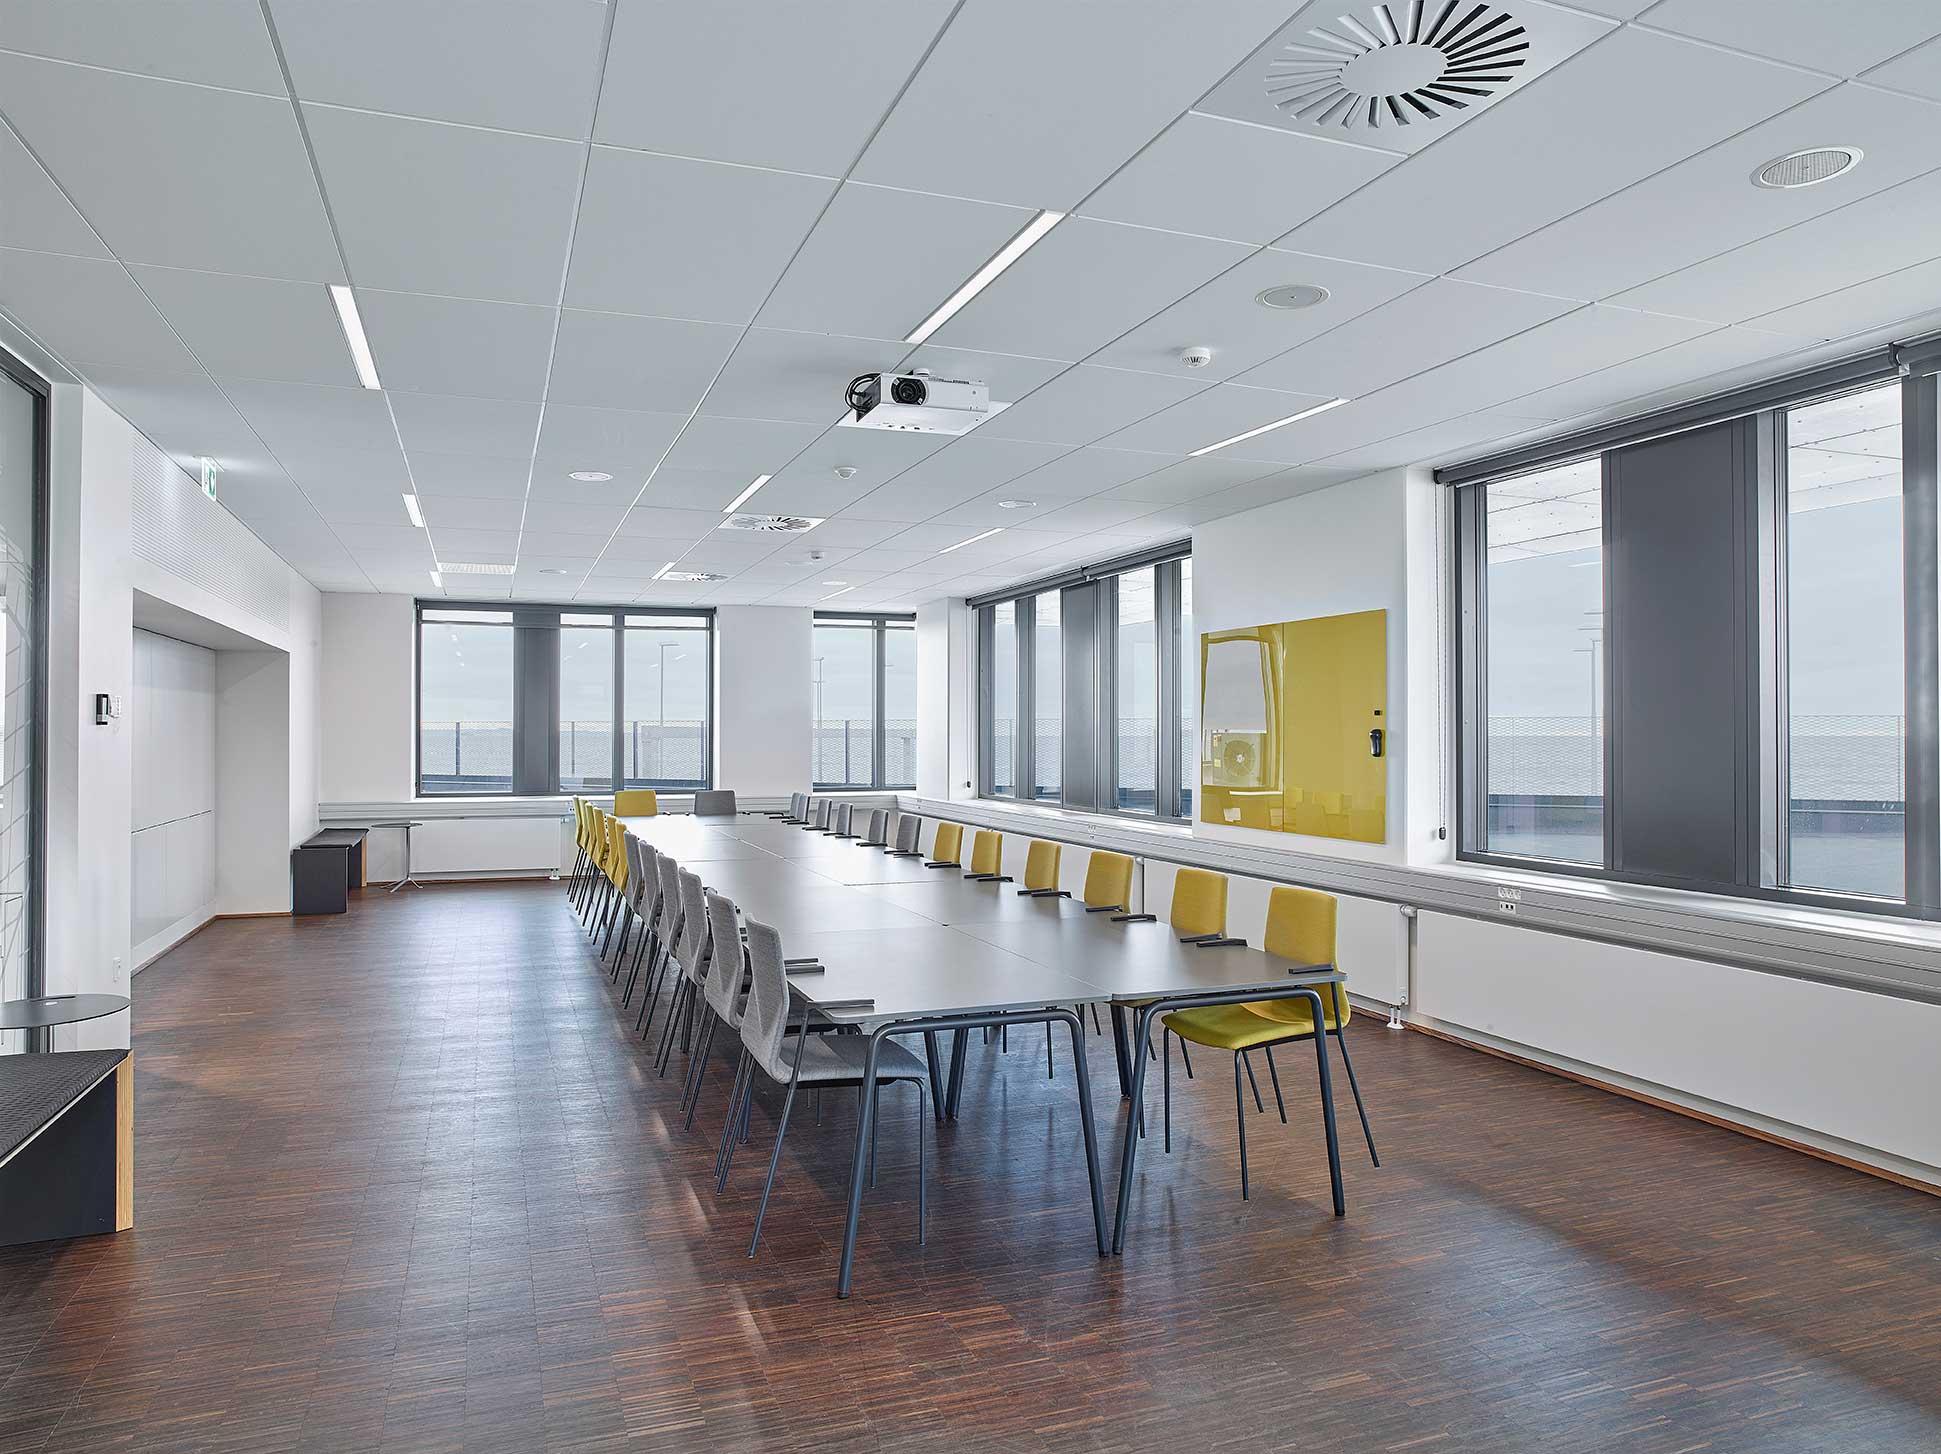 Matric Recessed Frameless M1 lampe indbygget i loftet i mødelokale - Luminex